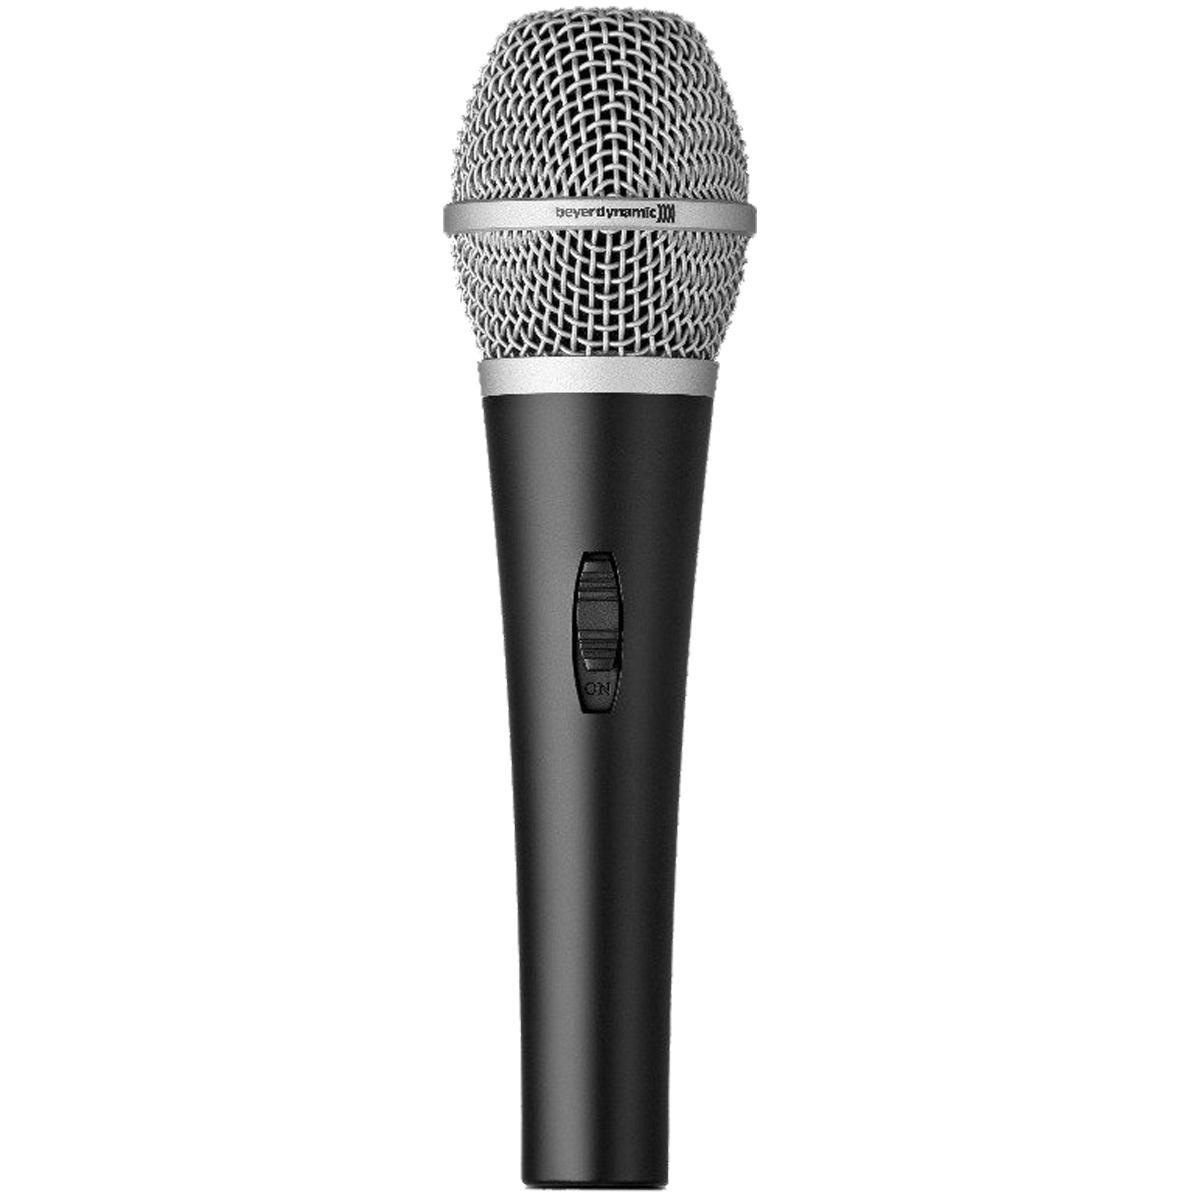 Beyerdynamic Microfone Dinâmico Supercardióide TG-V35s